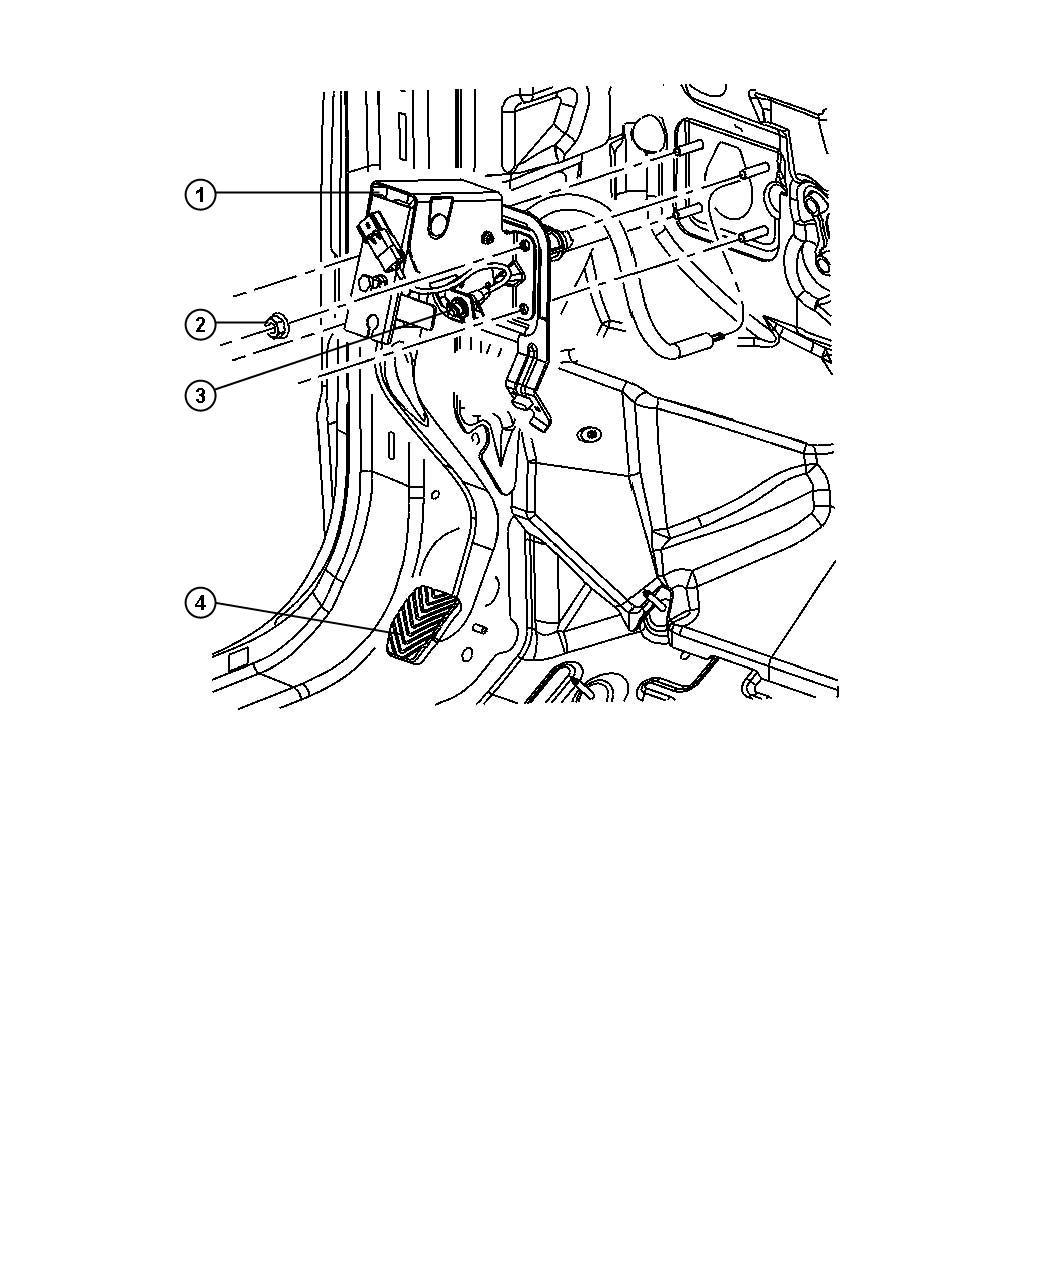 2009 Jeep Compass Switch. Clutch starter interlock. [5